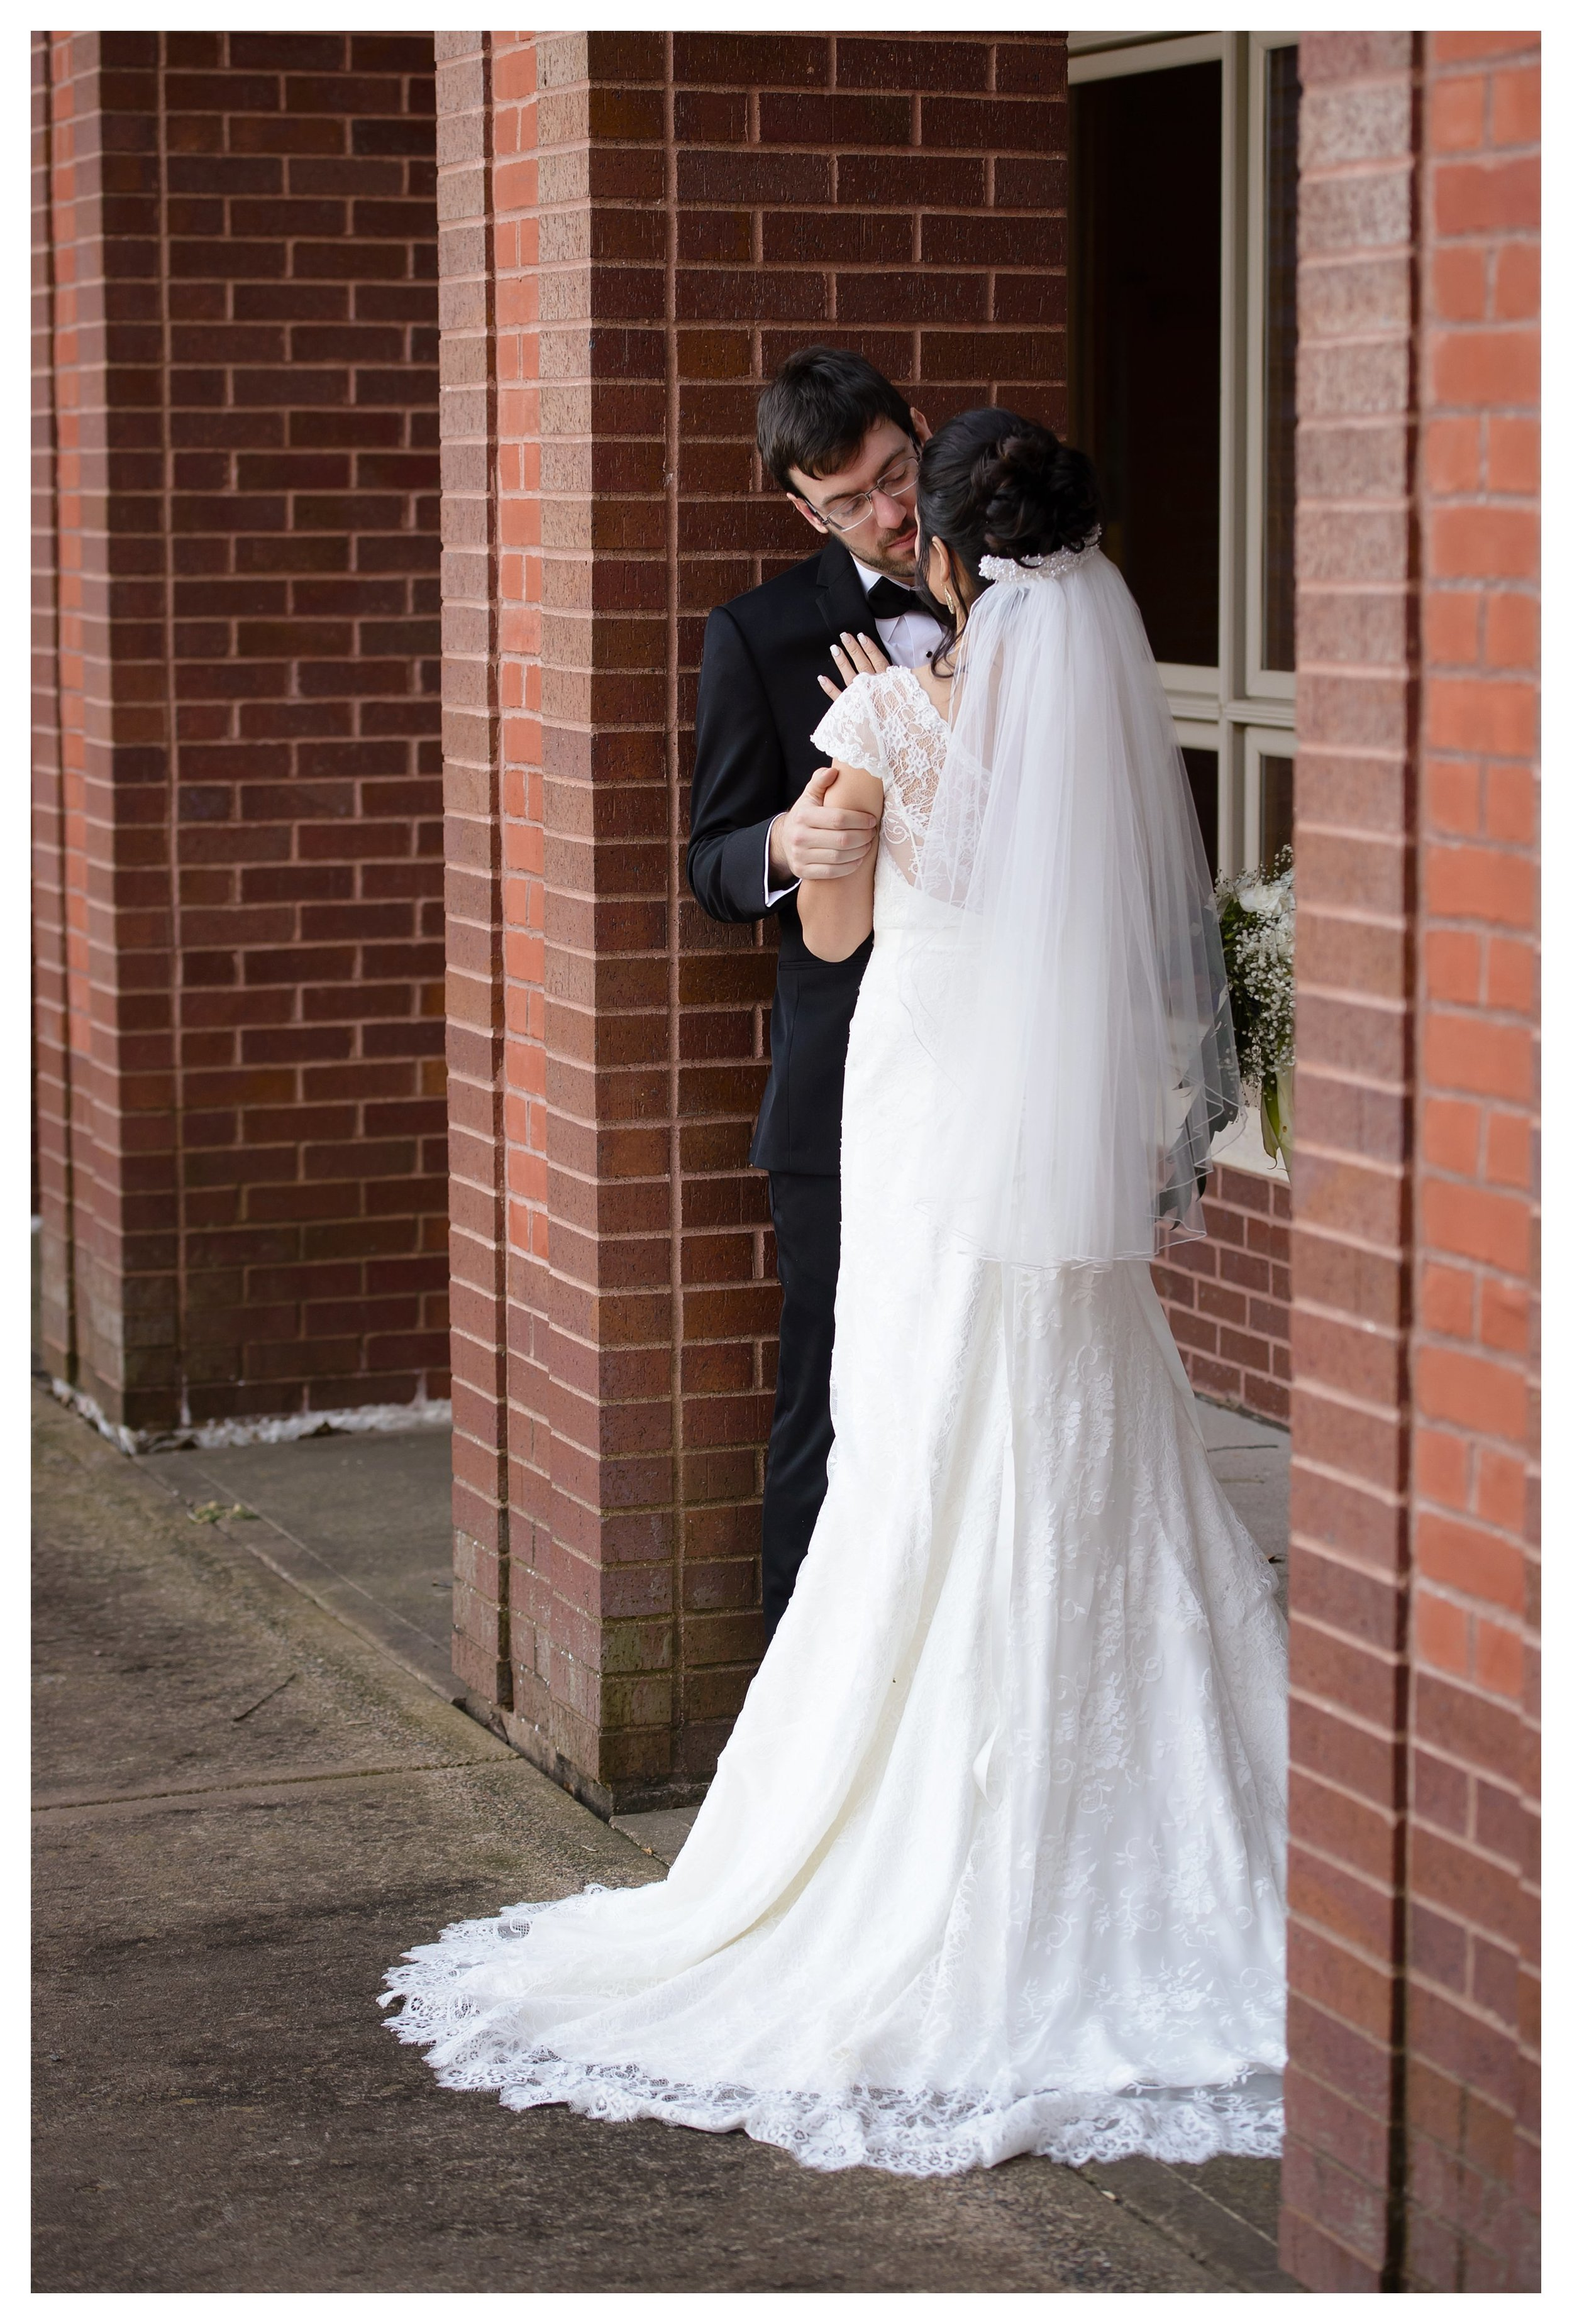 ashland wedding photographer iron river brule wisconsin ps 139 photography jen jensen_0145.jpg